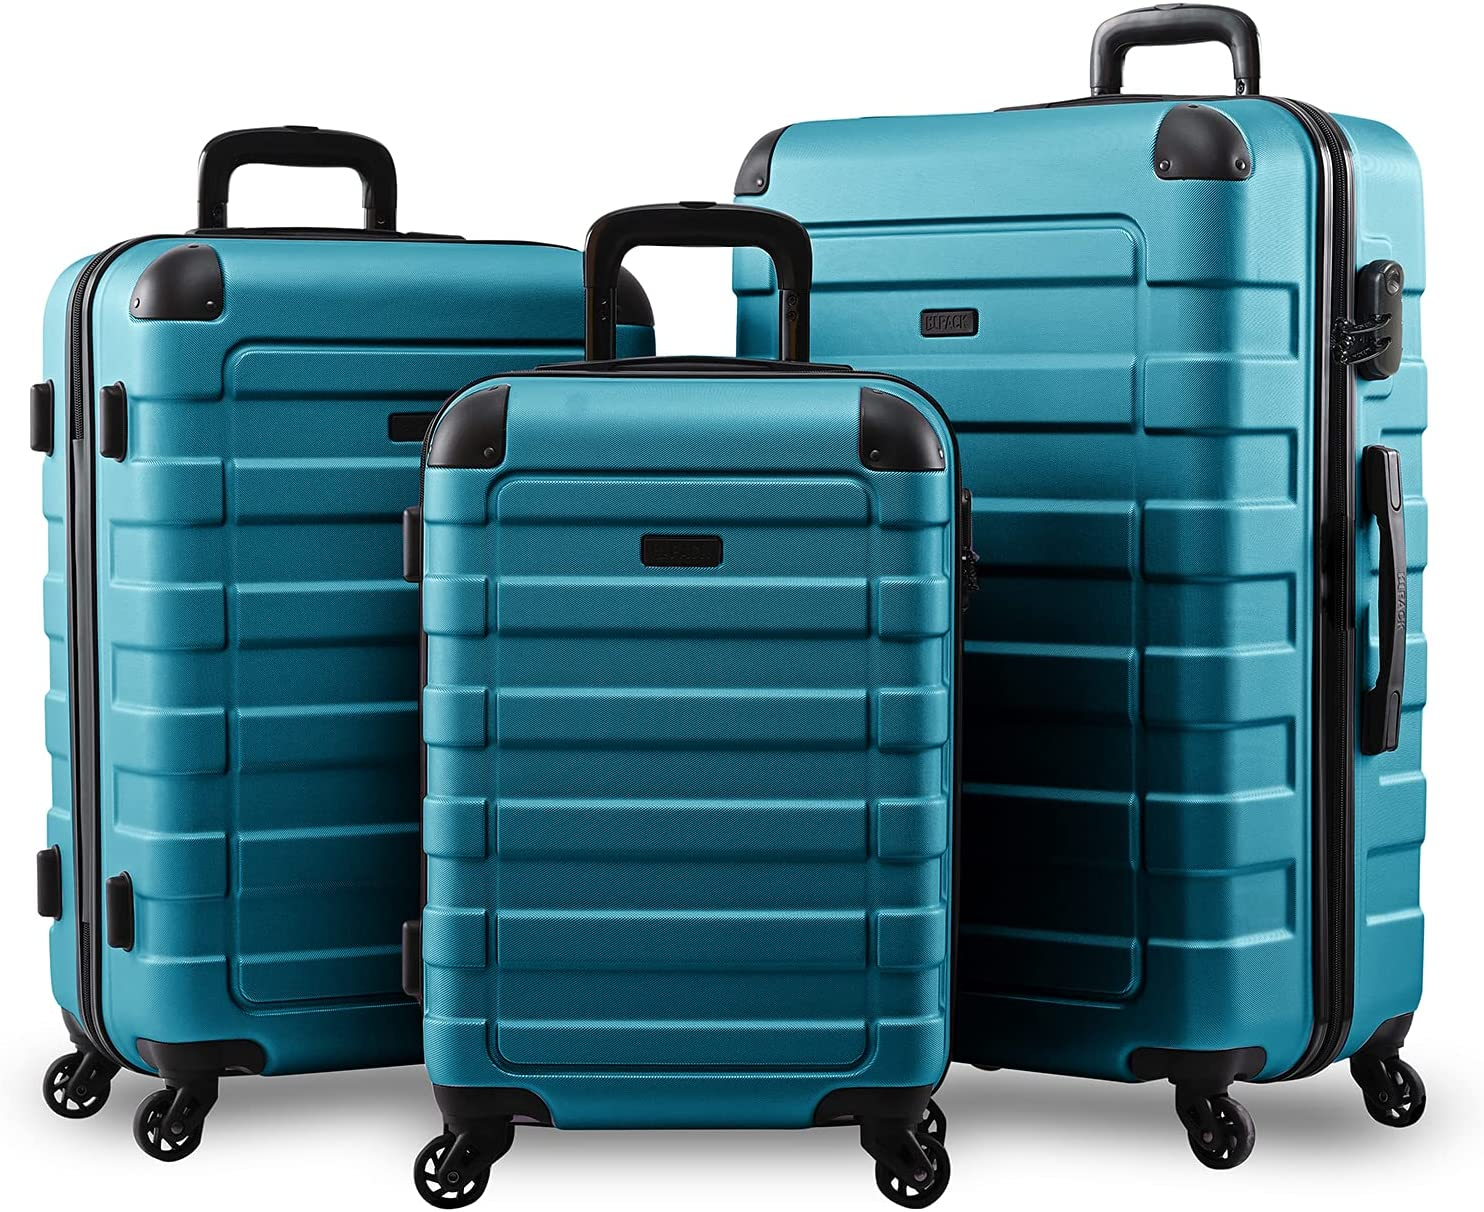 Hipack Prime Hardside Luggage